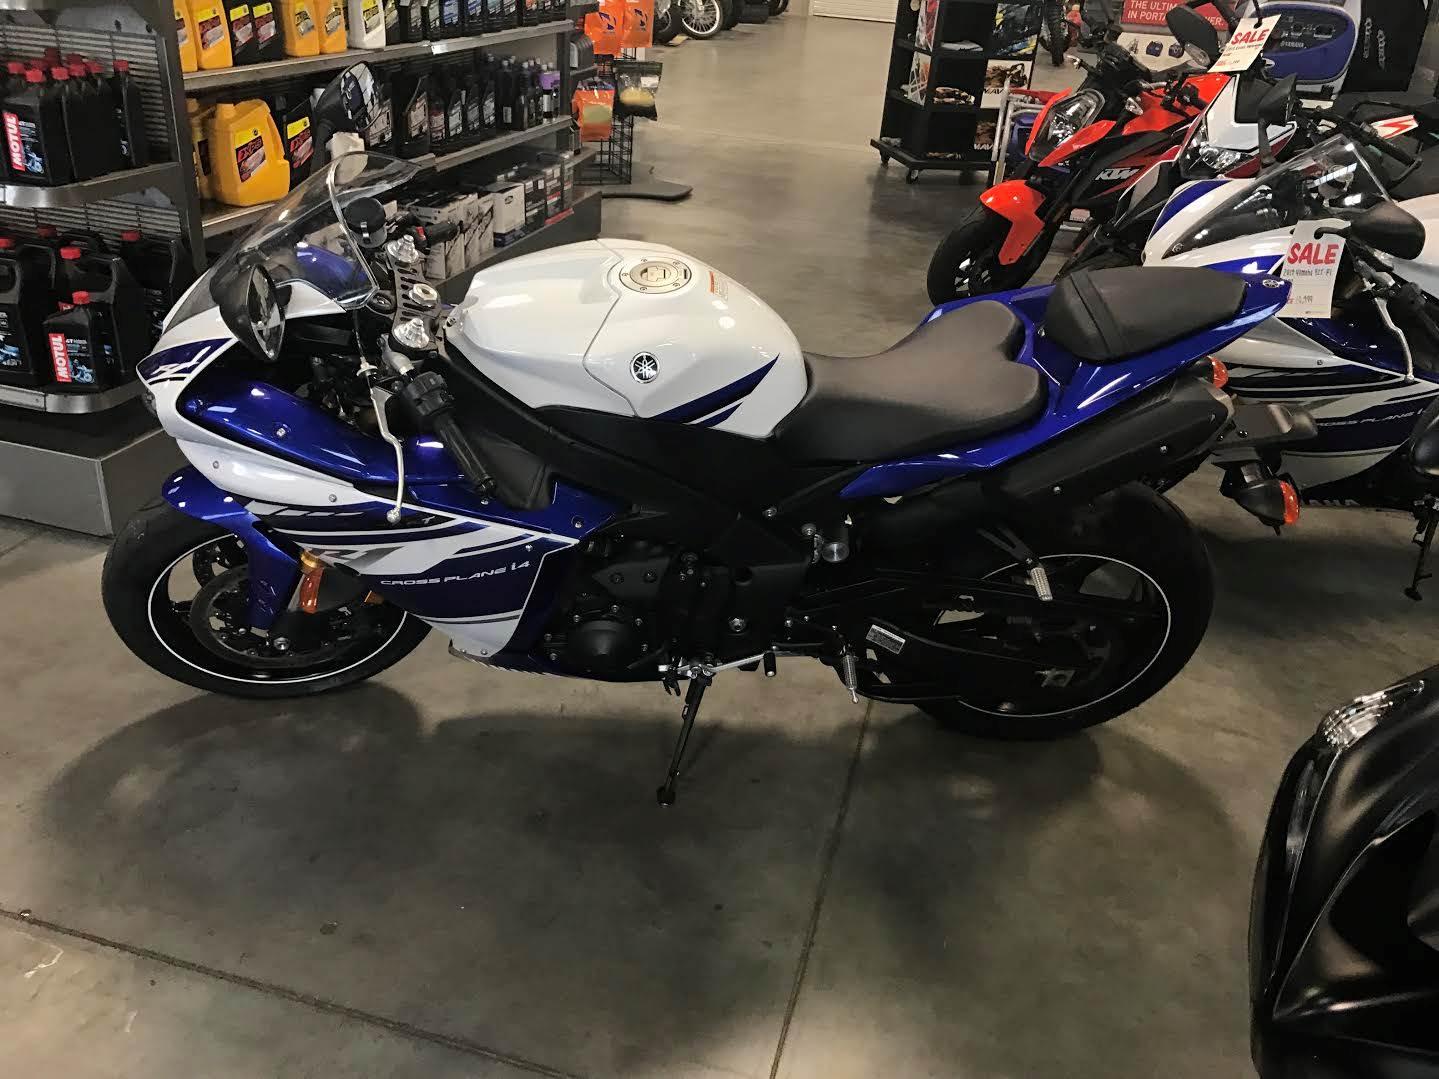 2014 Yamaha YZF-R1 in Las Vegas, Nevada